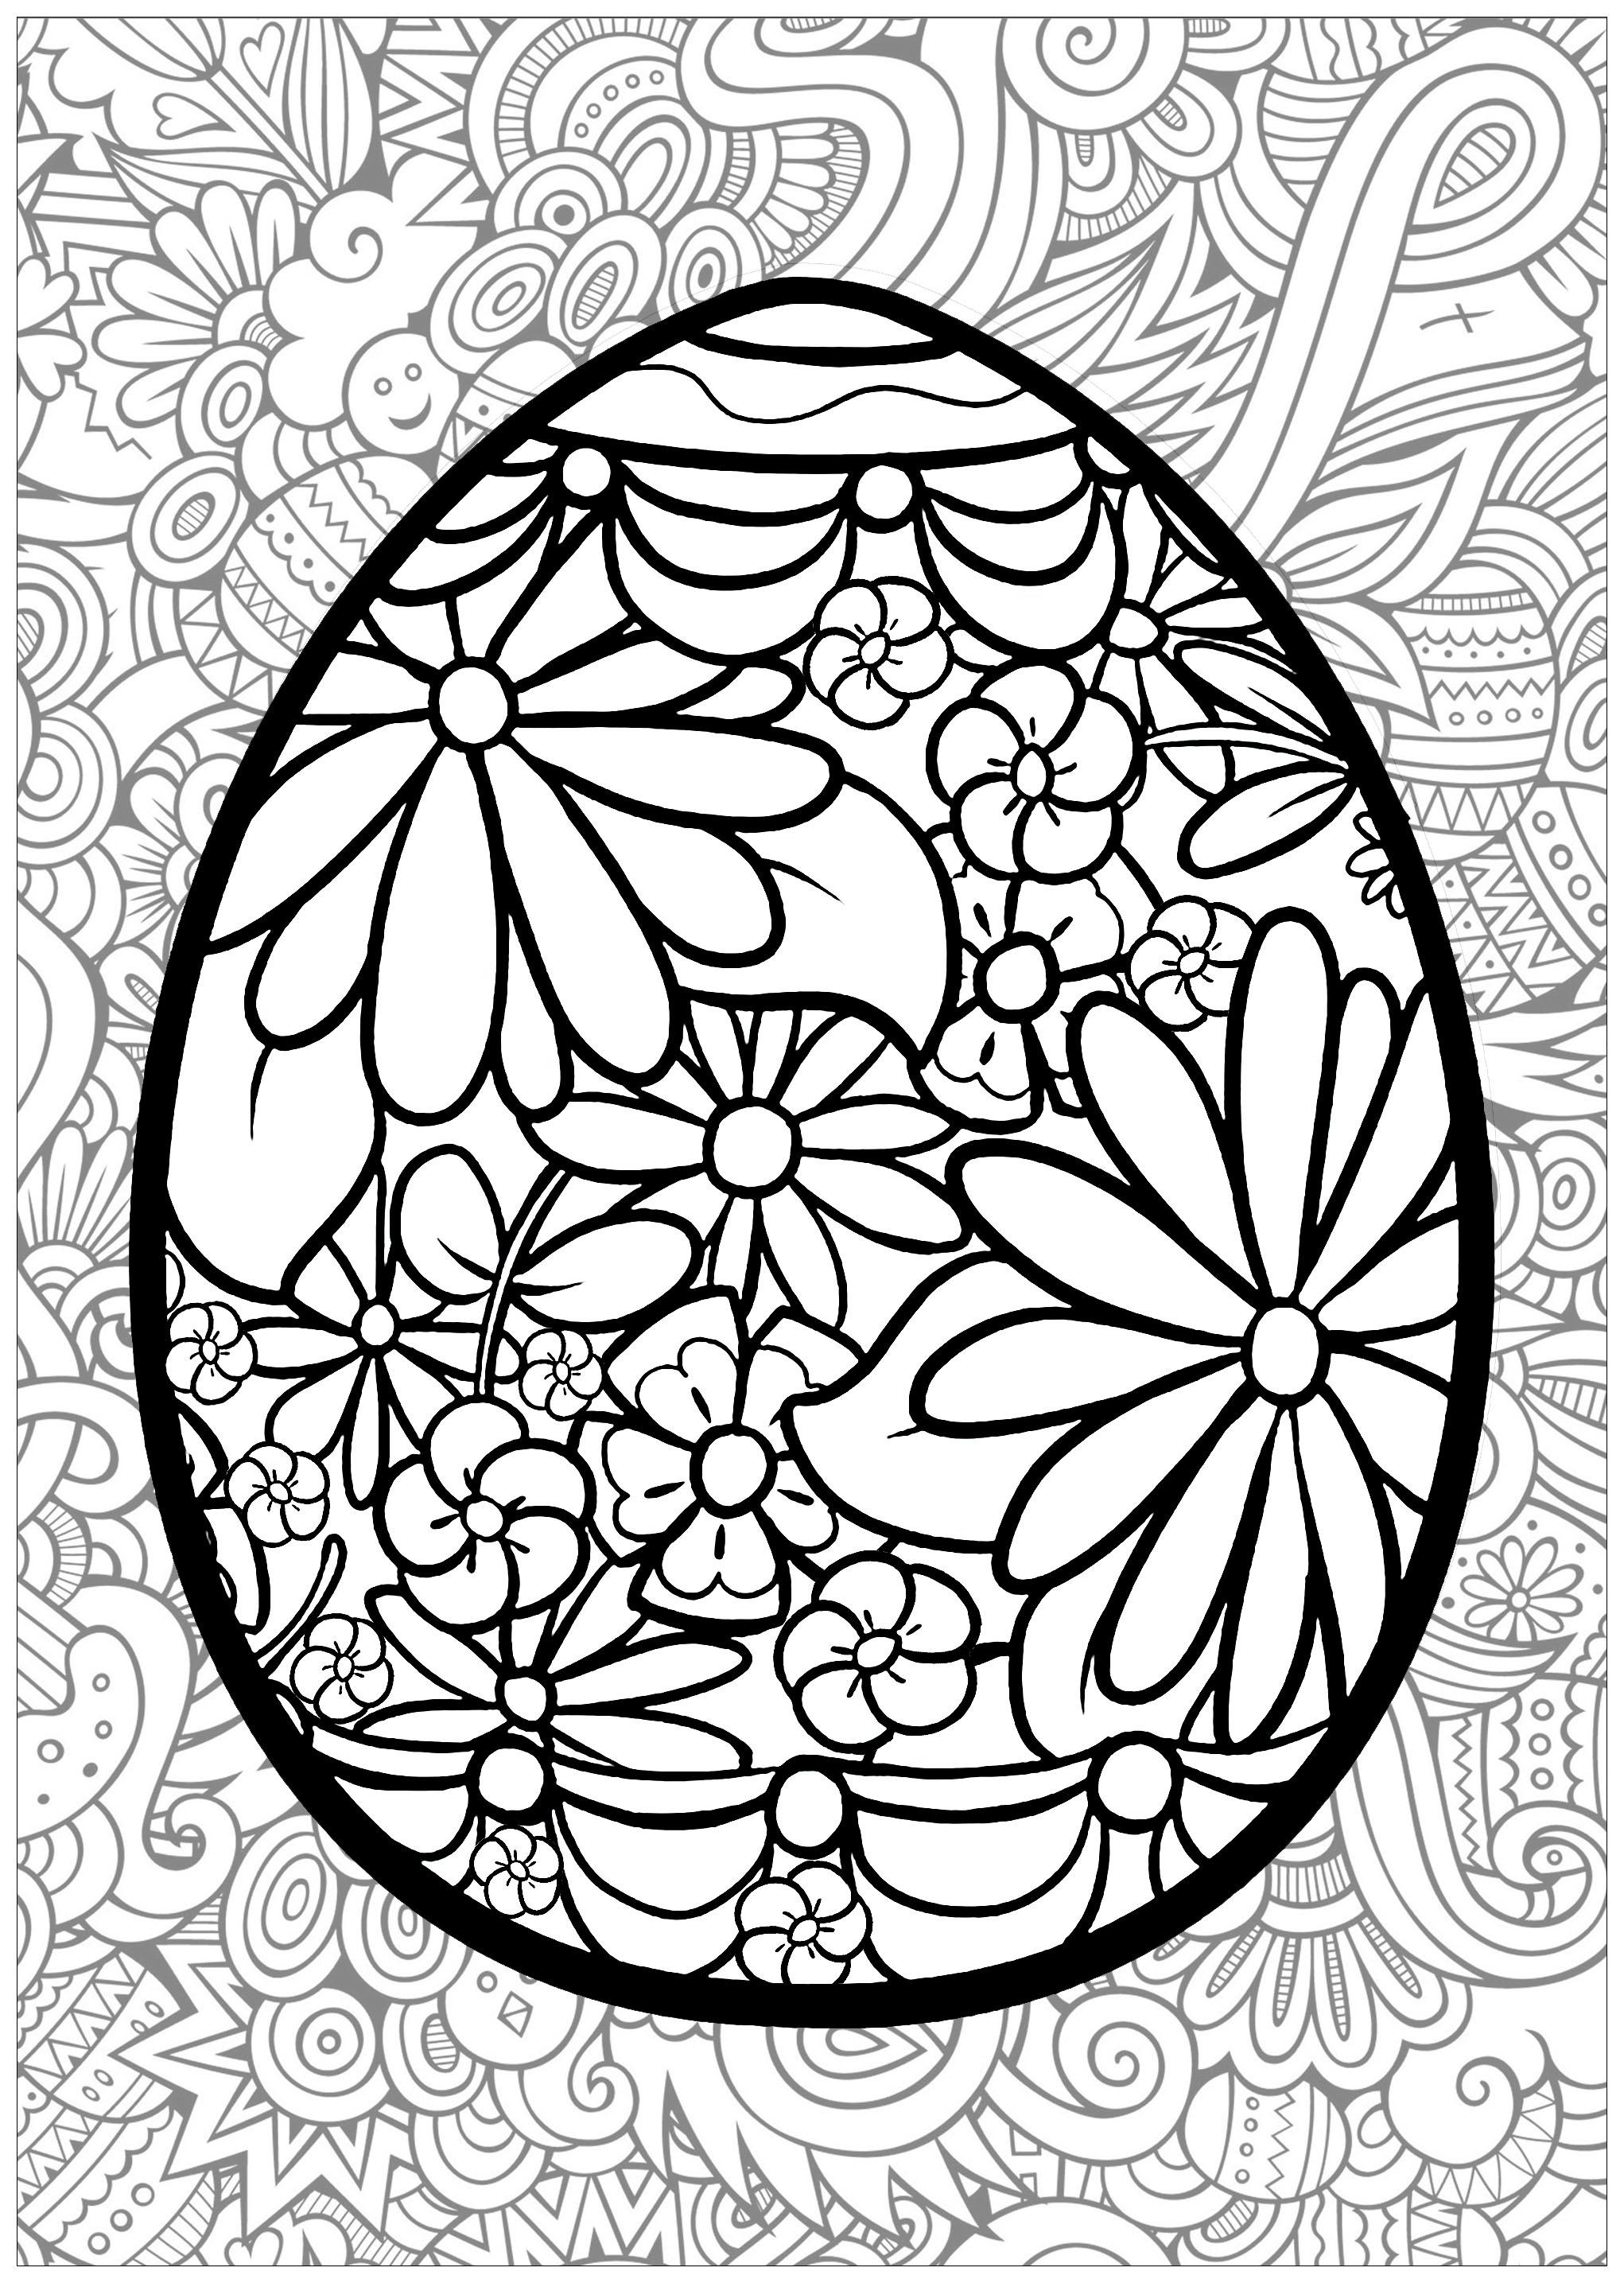 Pascua de resurreccion 95813 - Pascua de Resurrección - Colorear ...